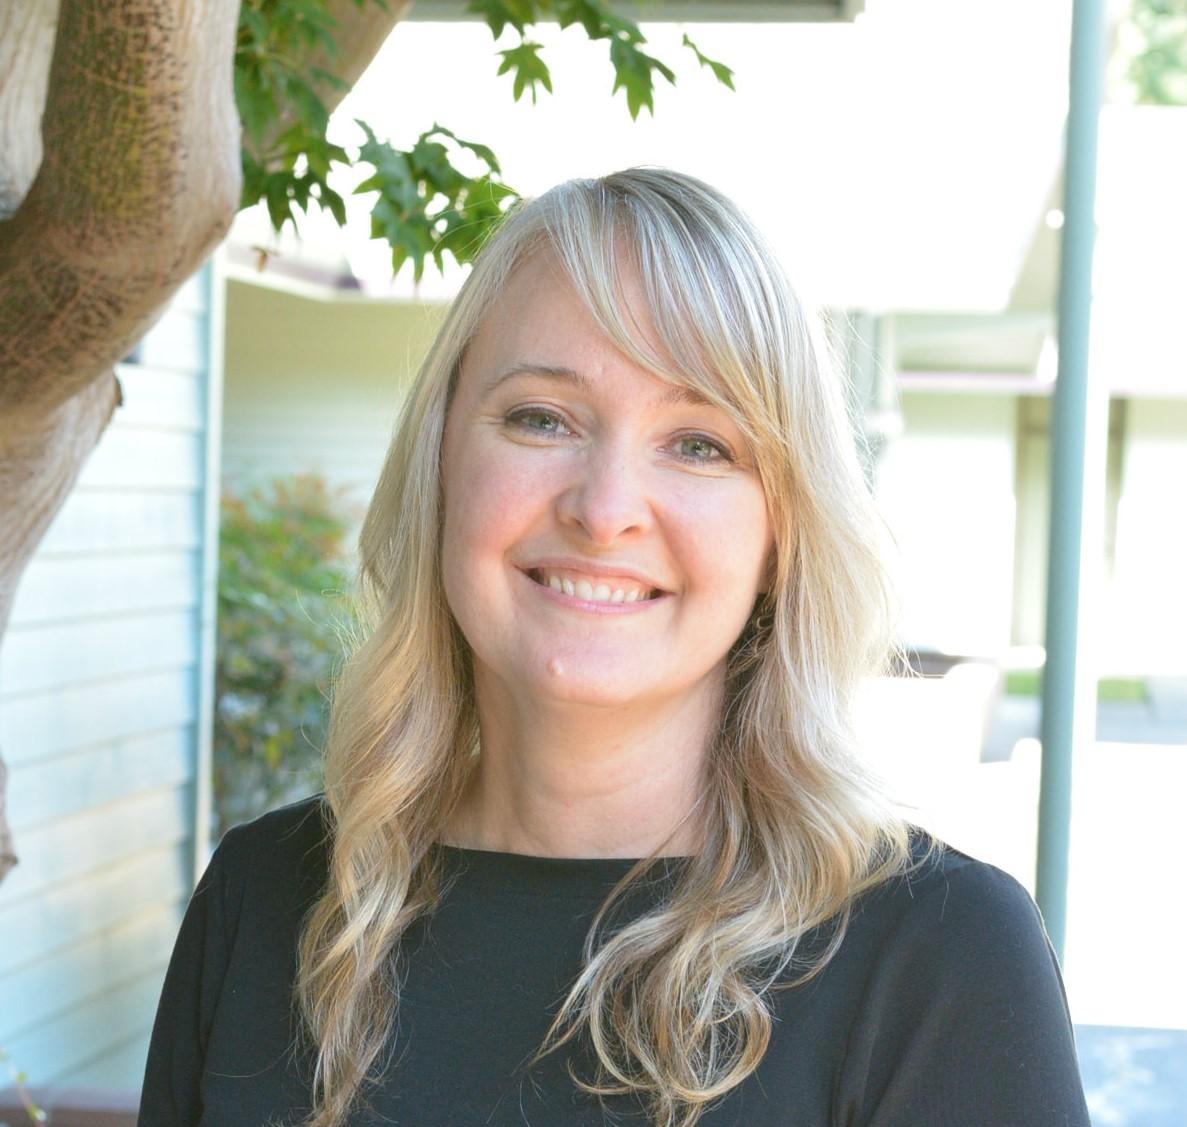 Laura Vaillancourt- LMHC & Geriatric Mental Health Specialist